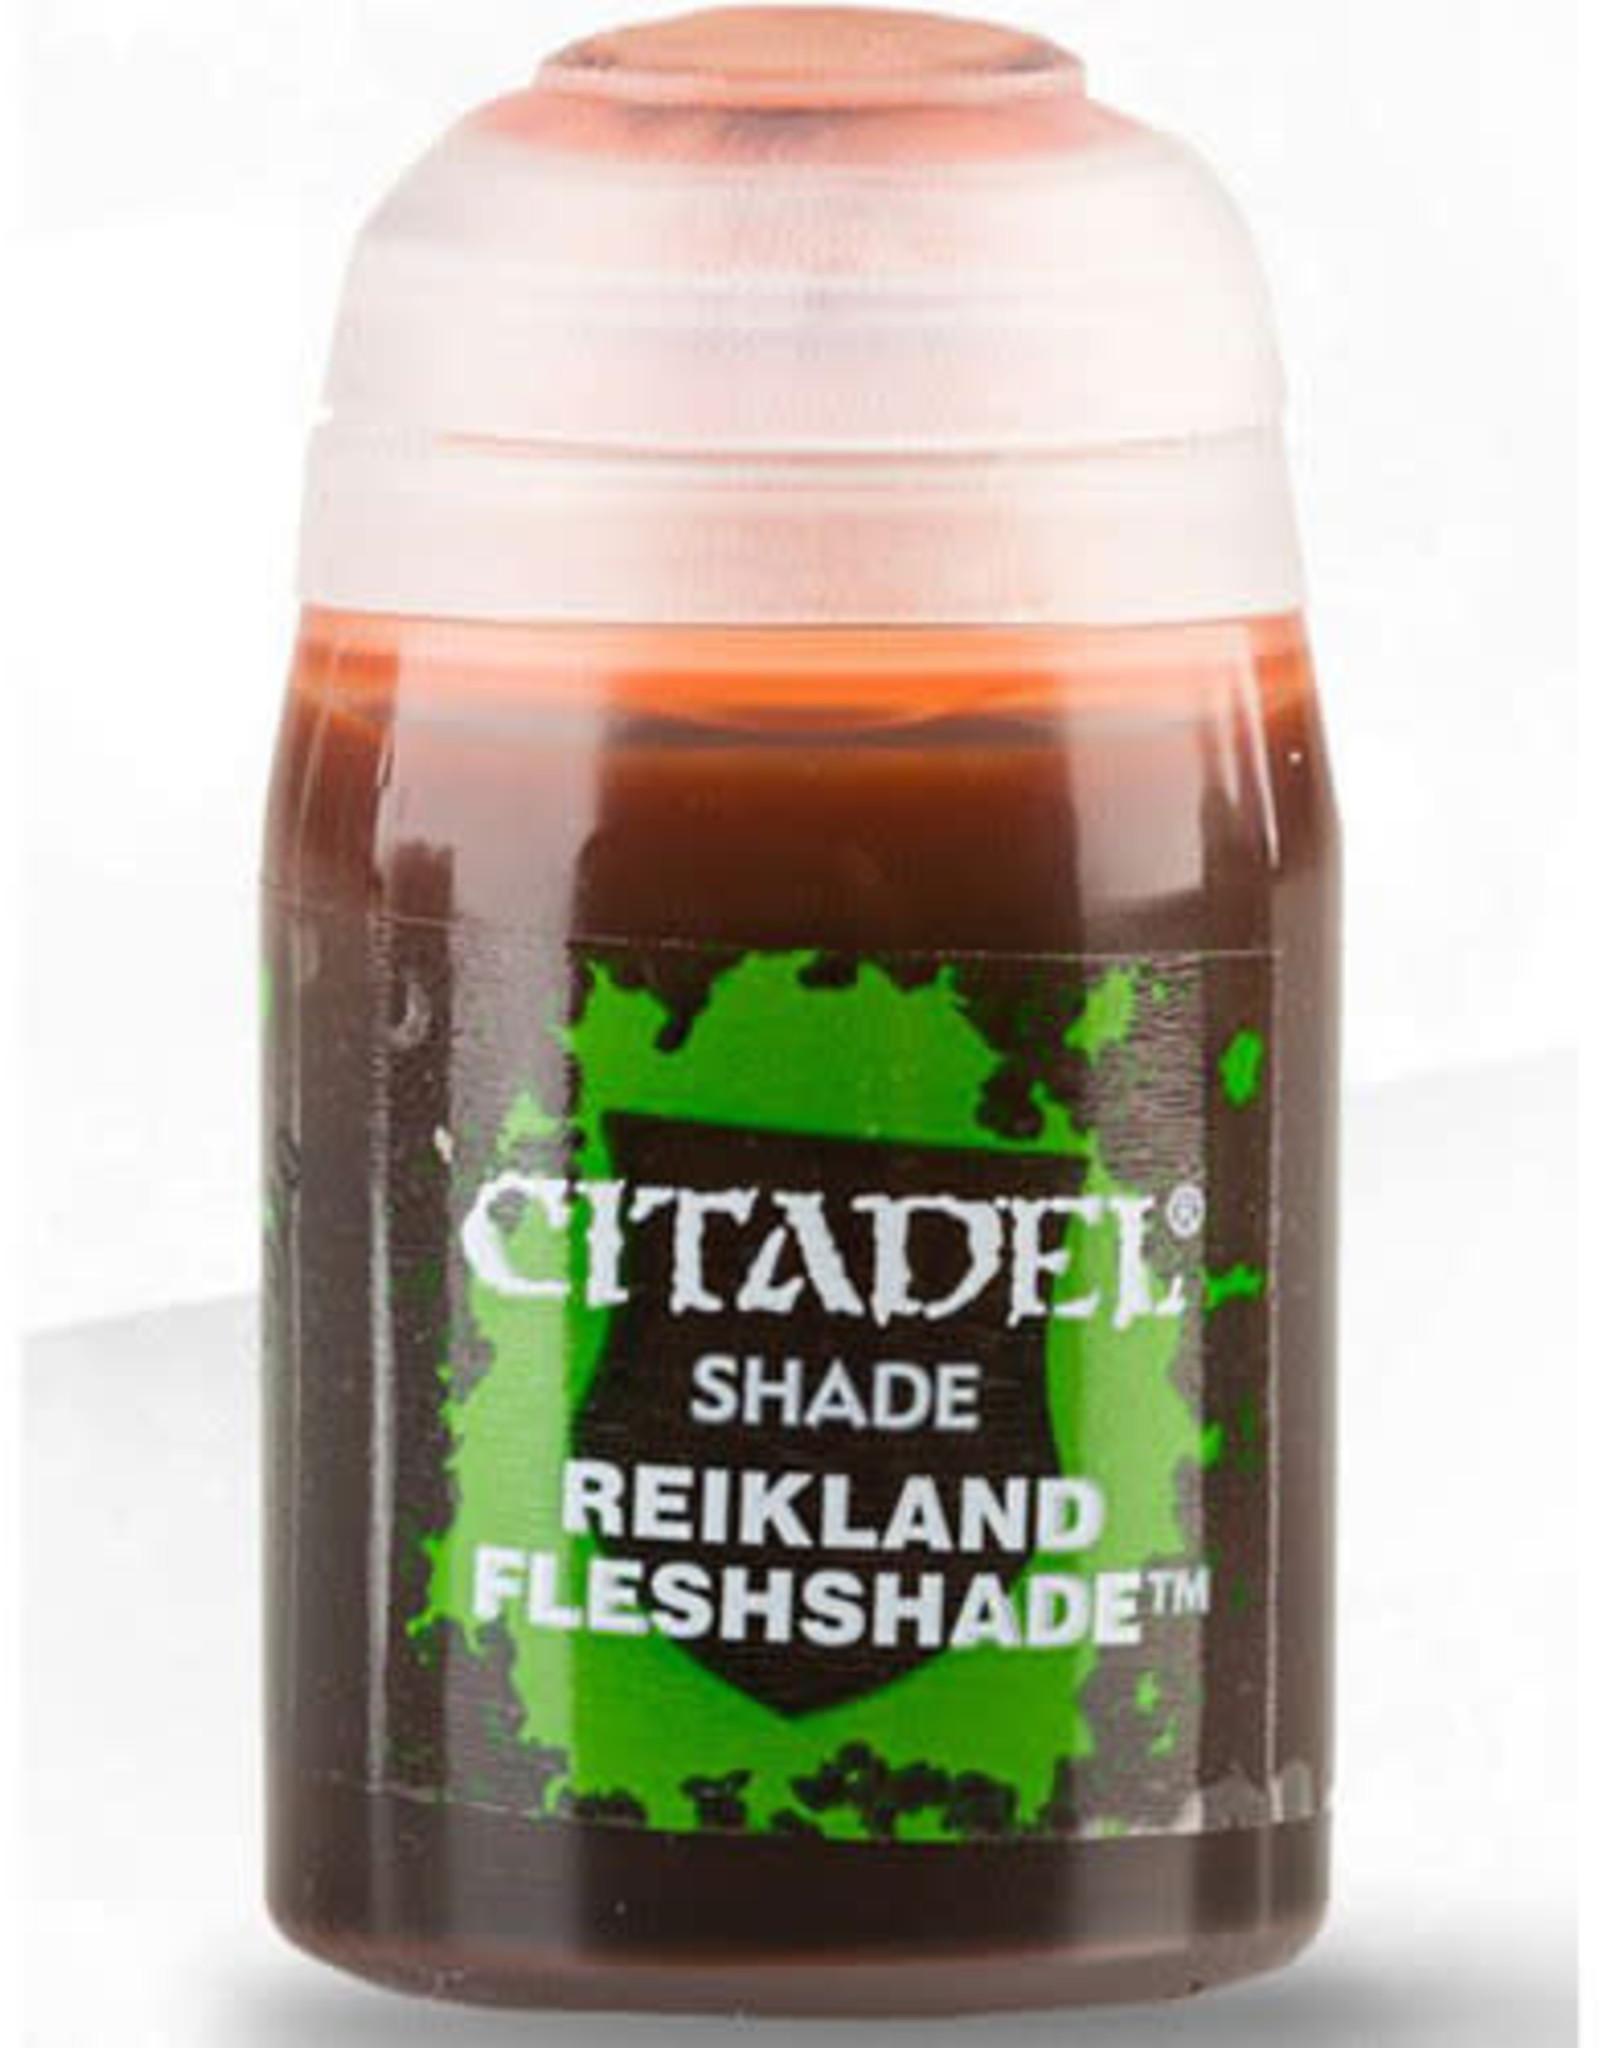 Games Workshop Citadel Paint: Shade - Reikland Fleshshade